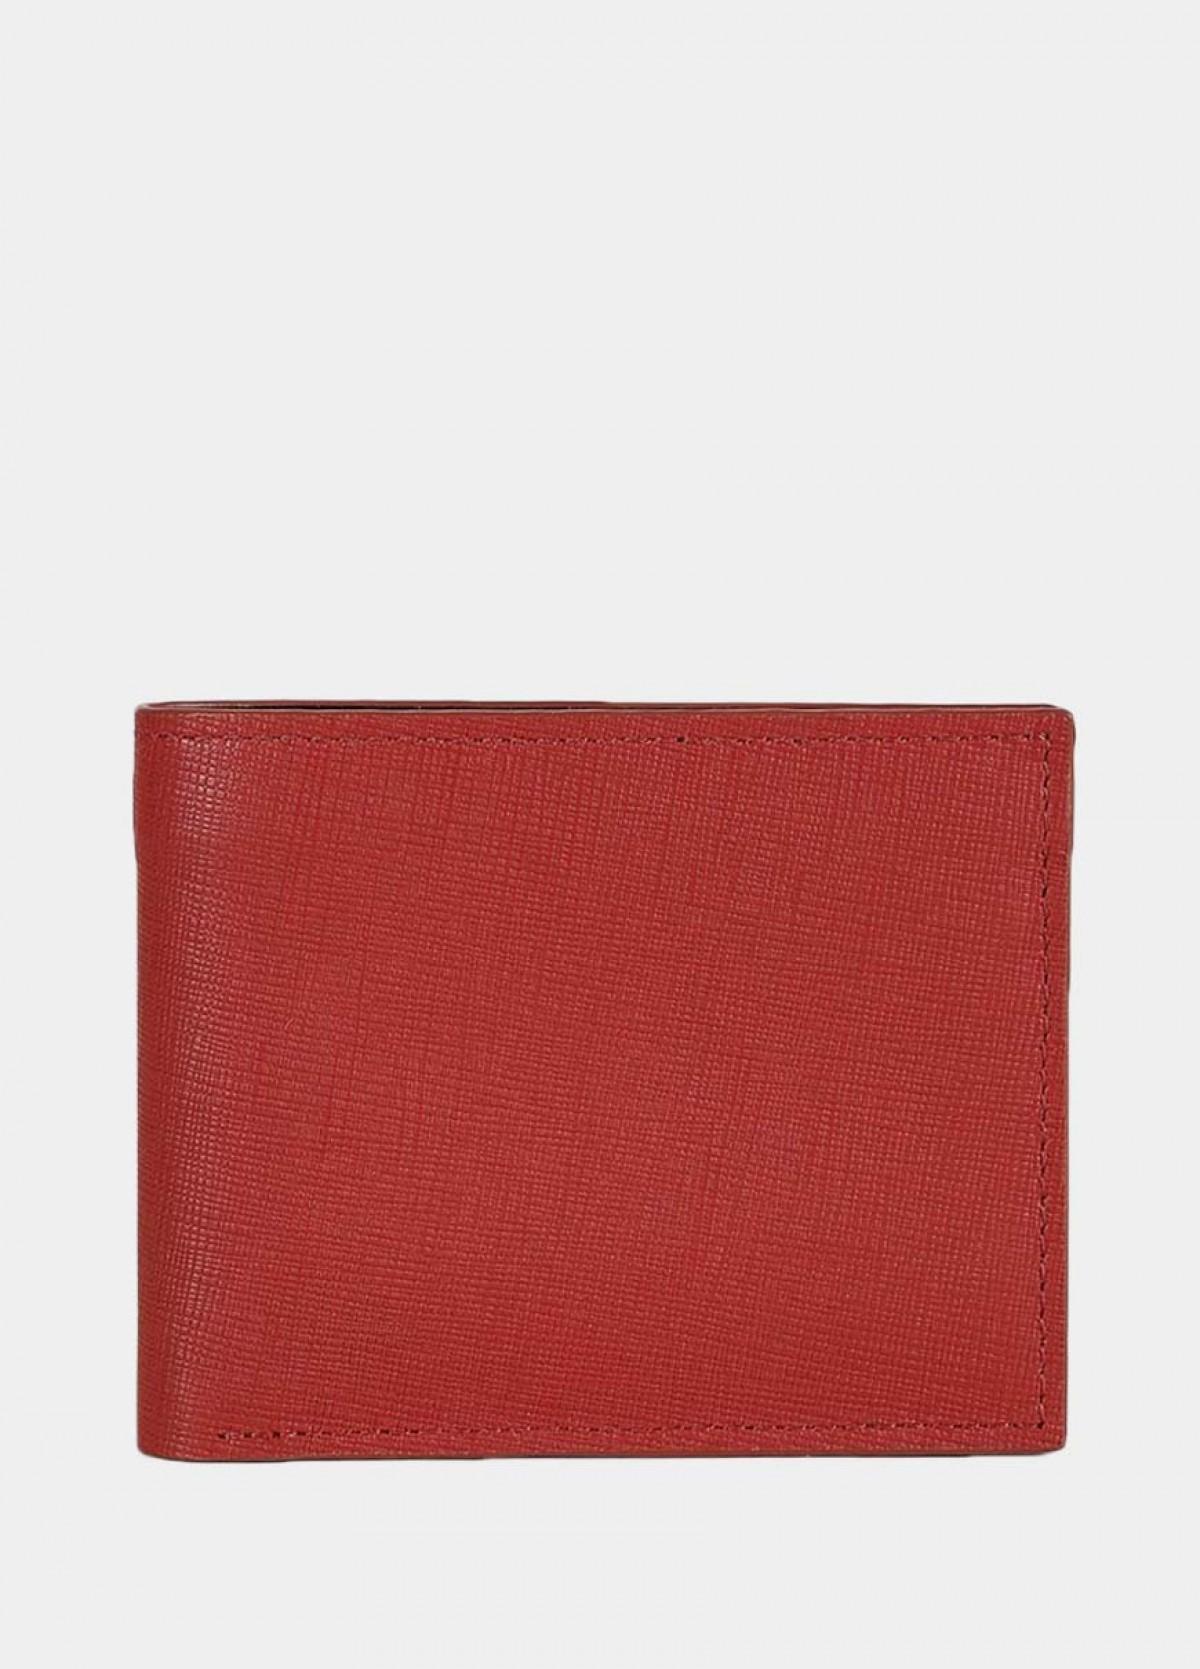 The Red Men Wallet